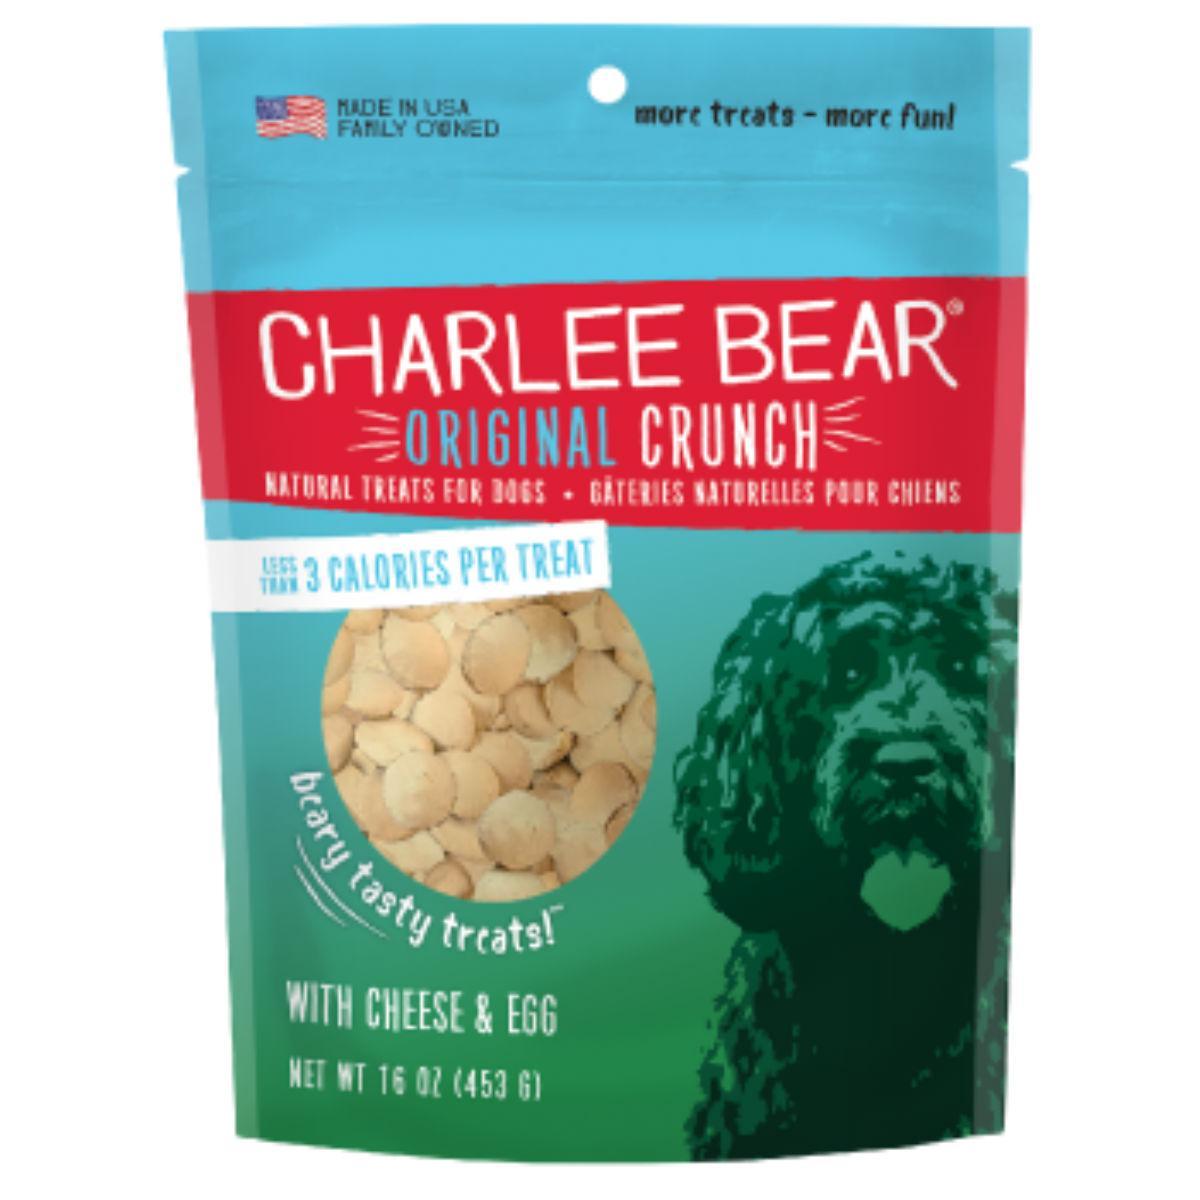 Charlee Bear Original Crunch Dog Treats - Cheese and Egg